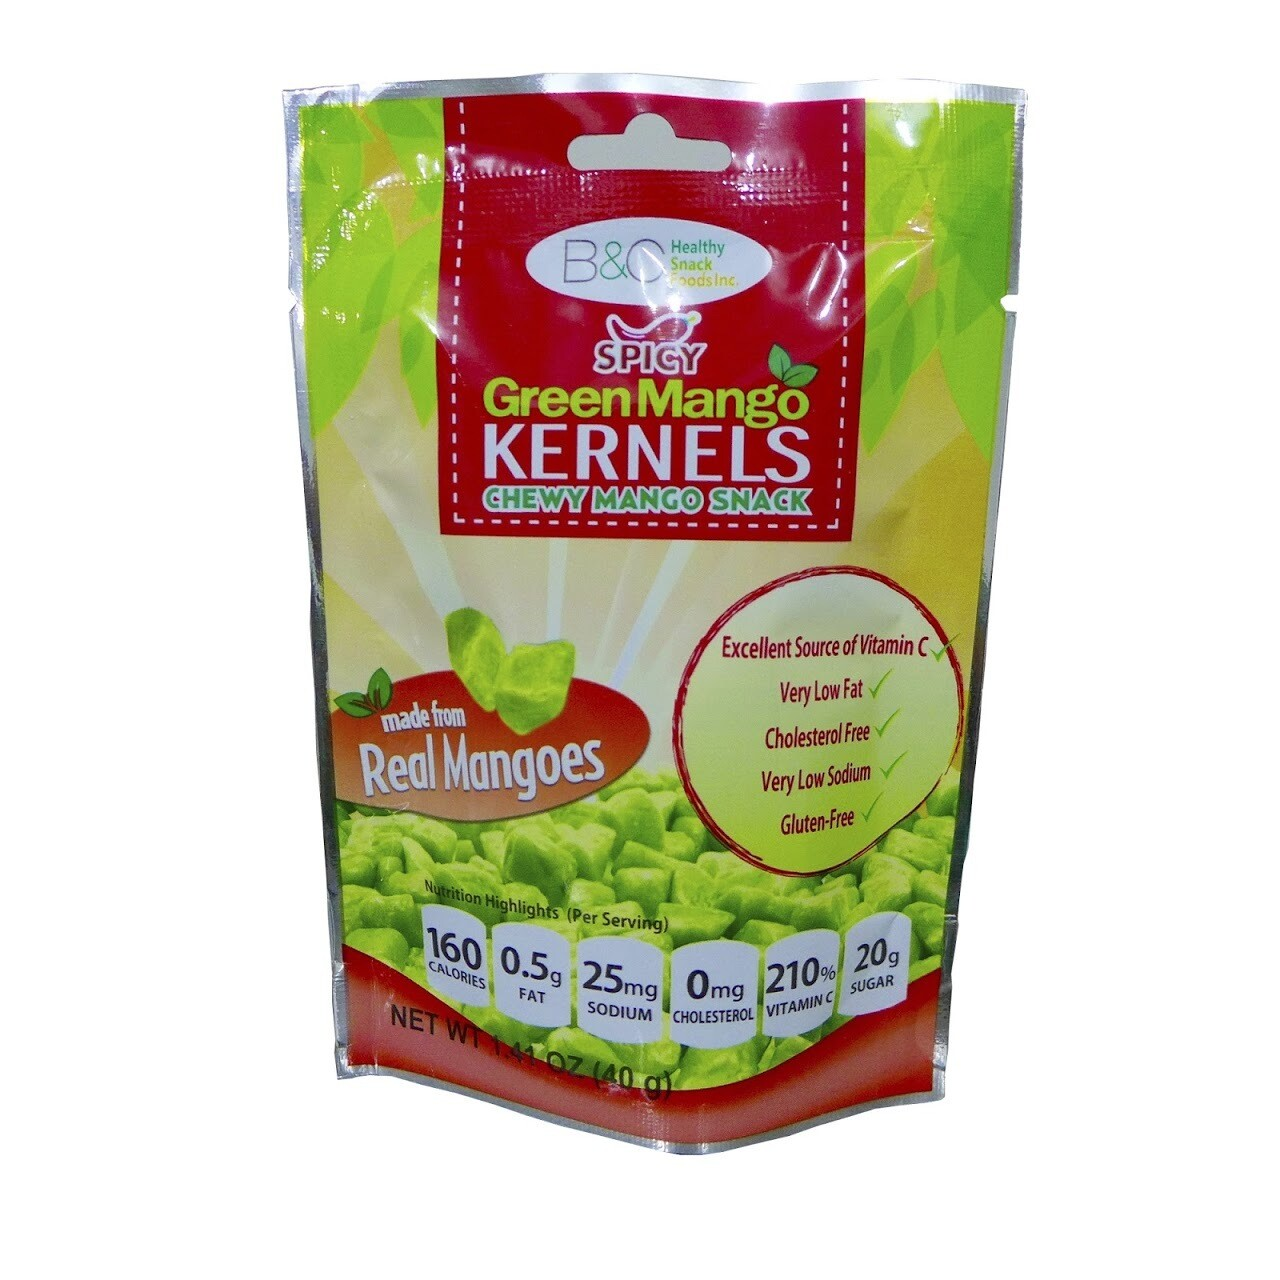 B&C Spicy Green Mango Chews 40g pouch